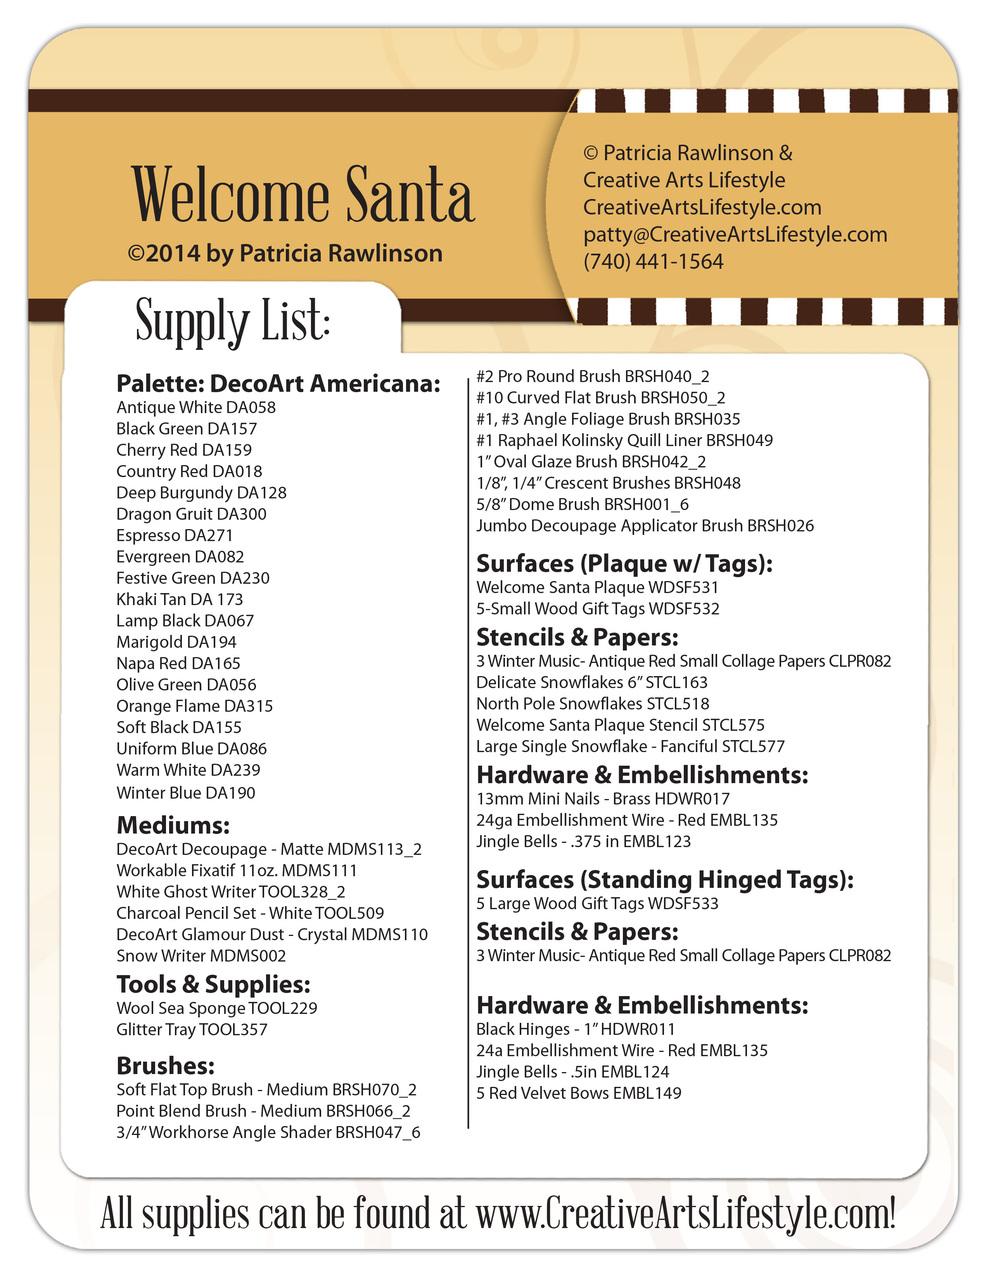 Welcome Santa Pattern Packet - Patricia Rawlinson